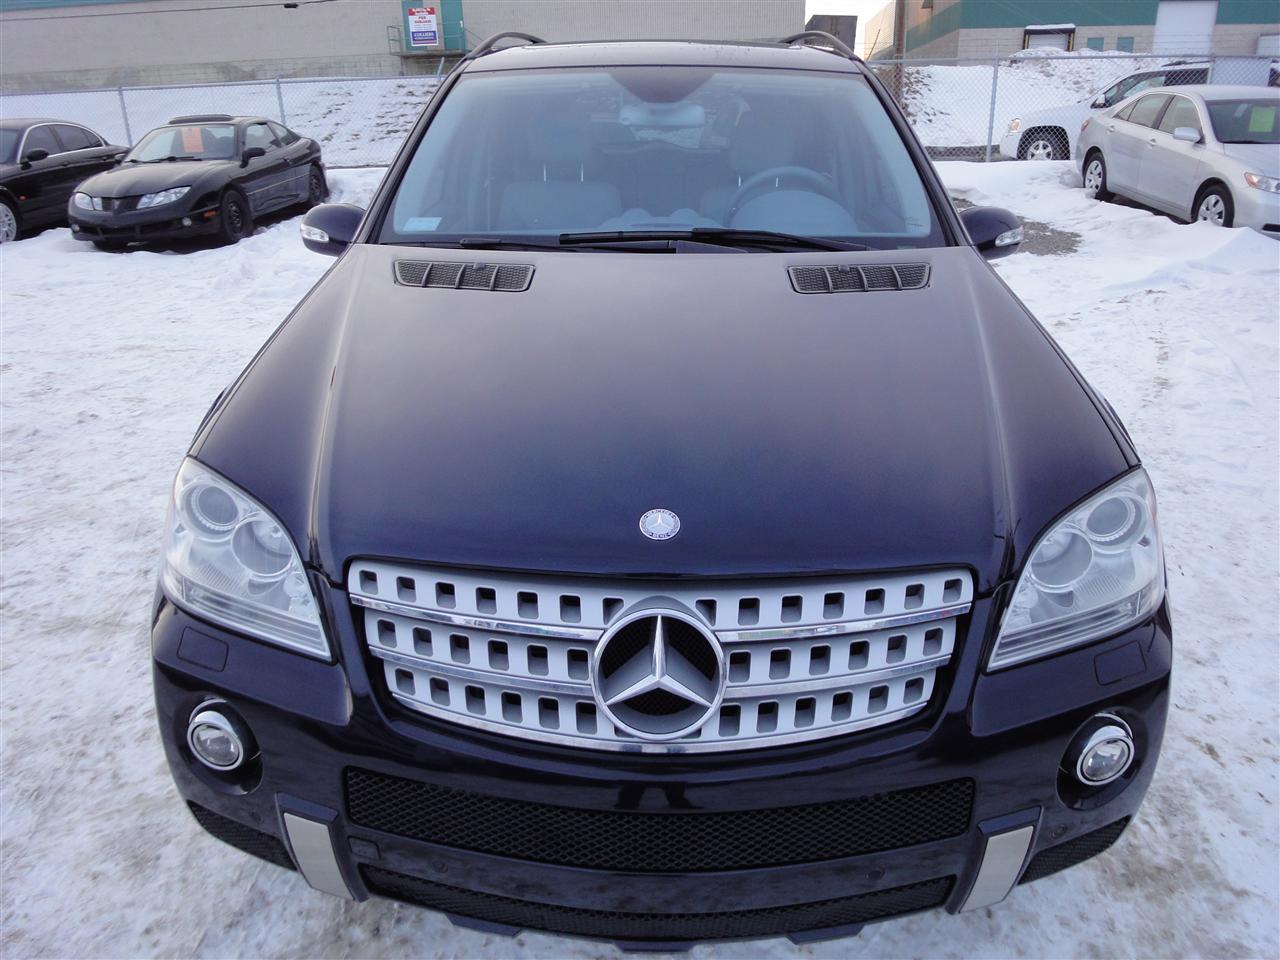 2006 mercedes benz ml500 amg appearance pkg envision auto. Black Bedroom Furniture Sets. Home Design Ideas